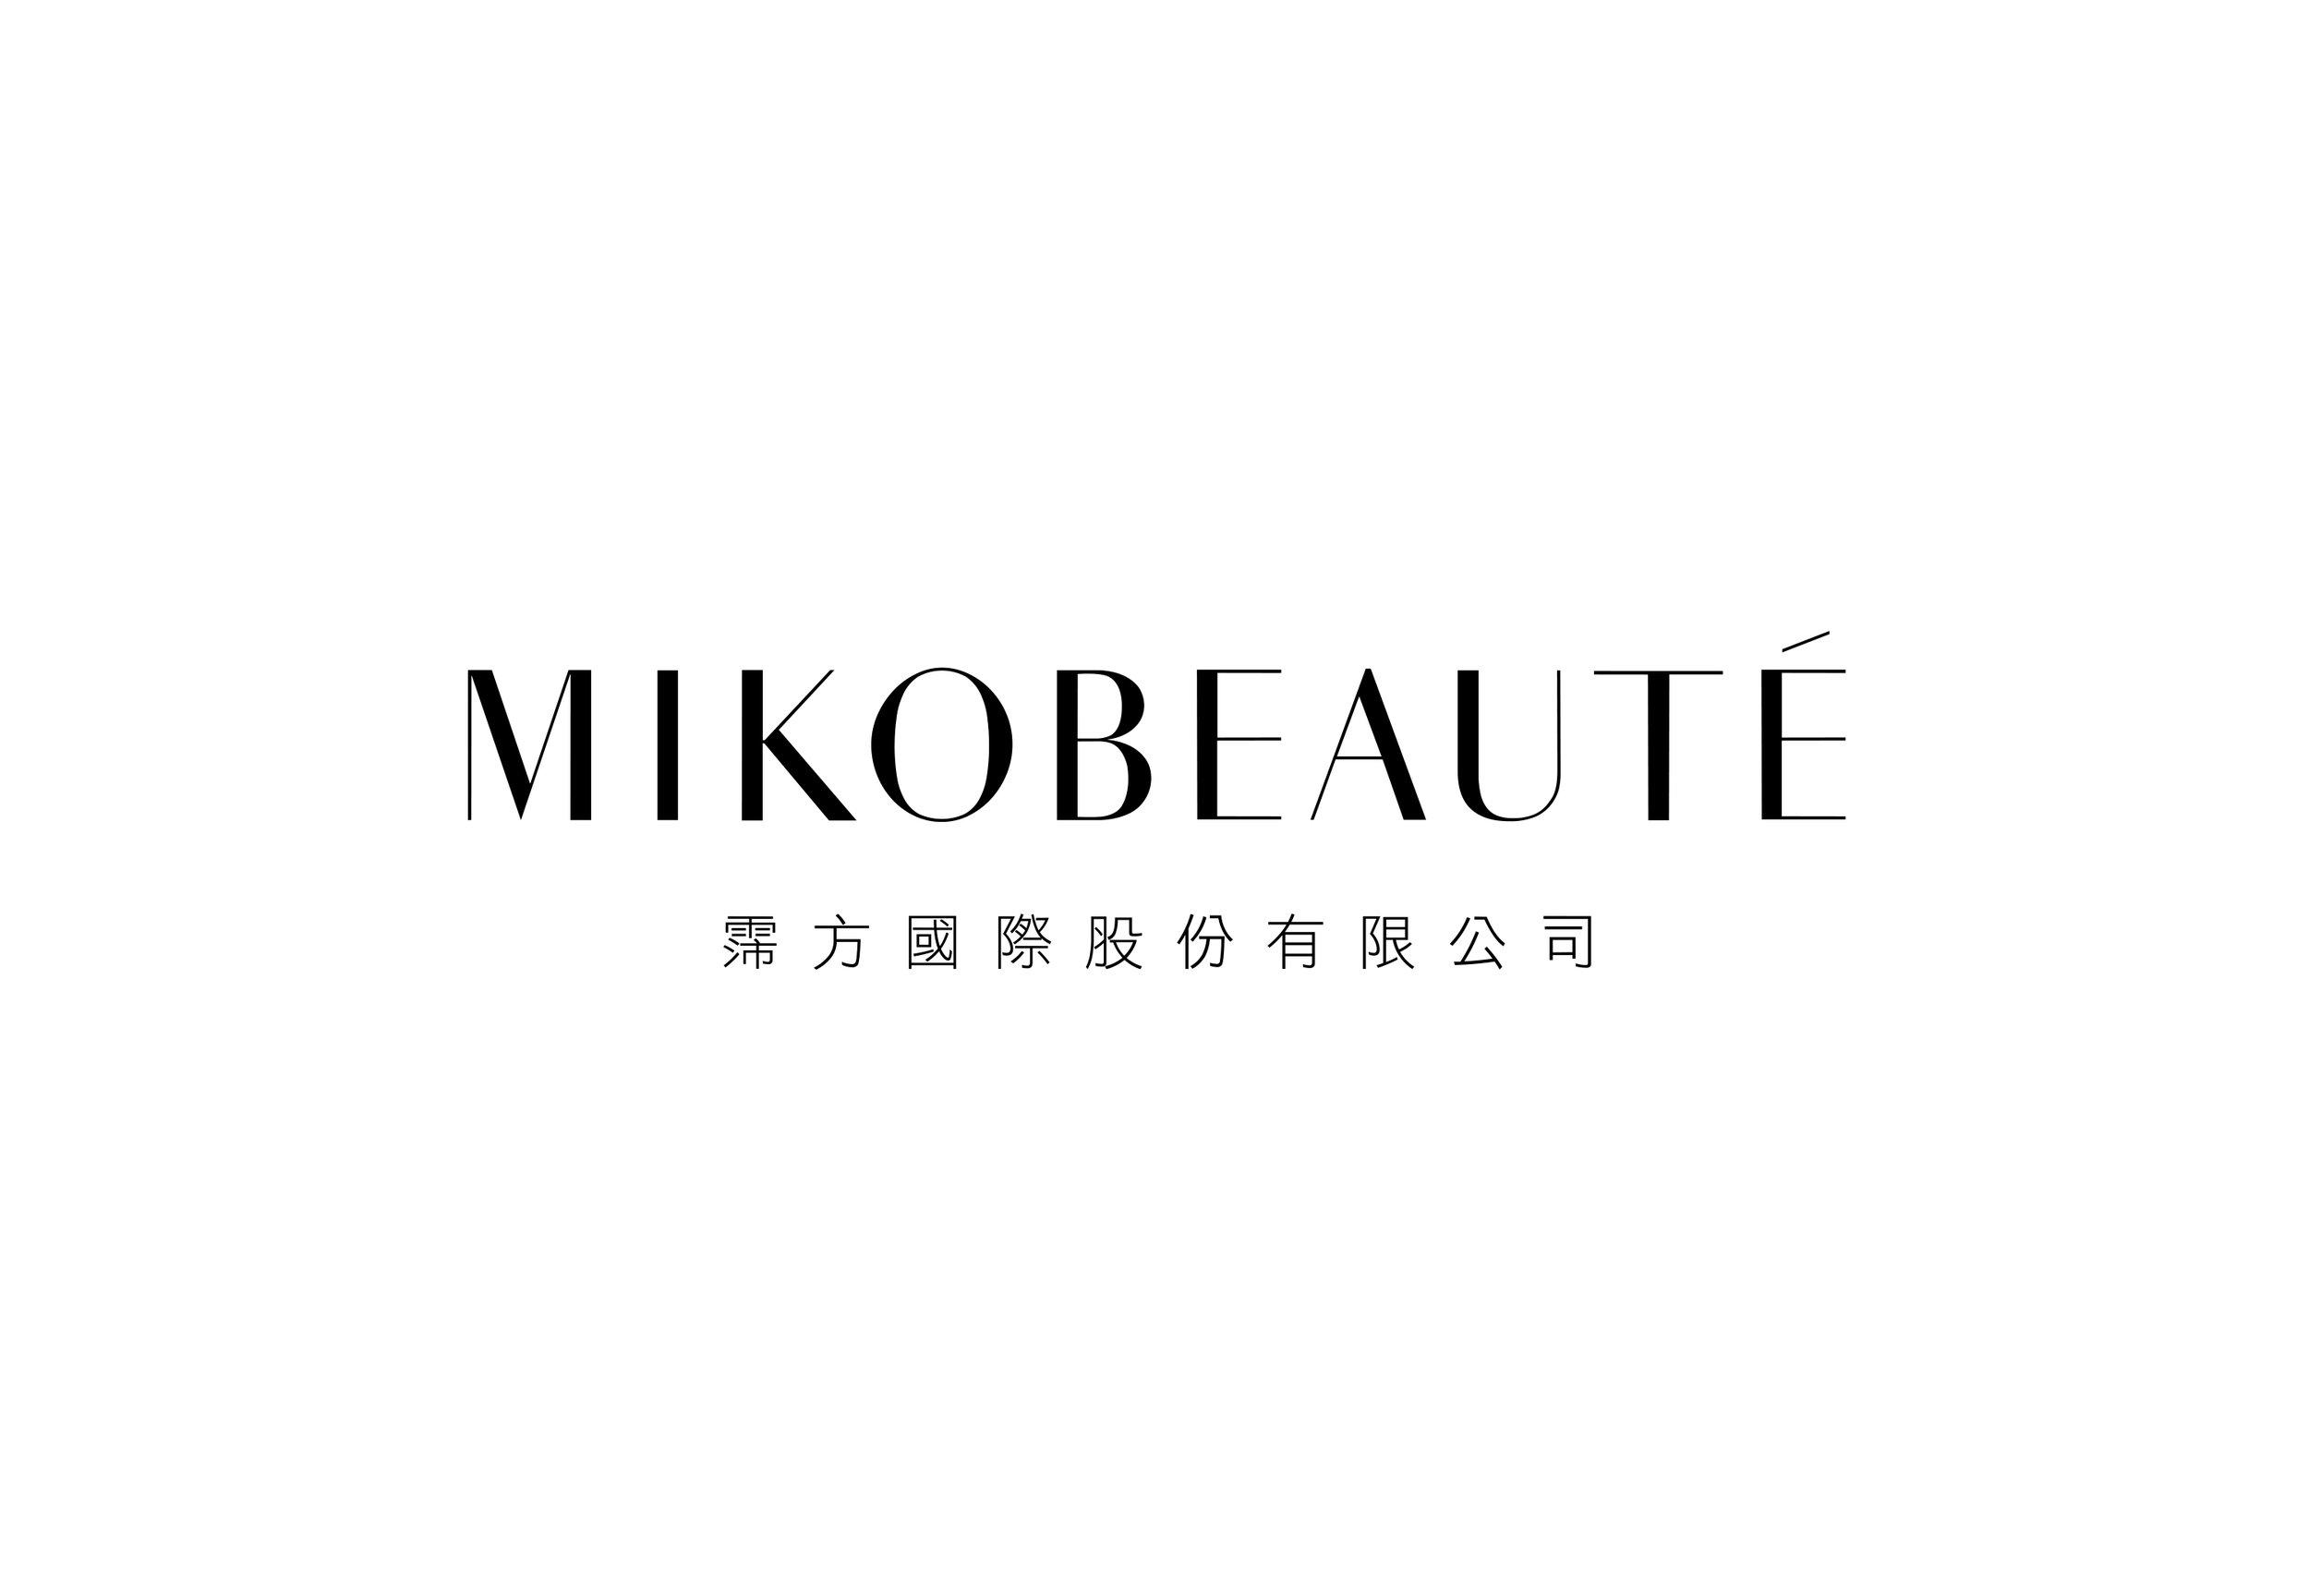 squarespace 客戶公版_MIKOBEAUTE.jpg